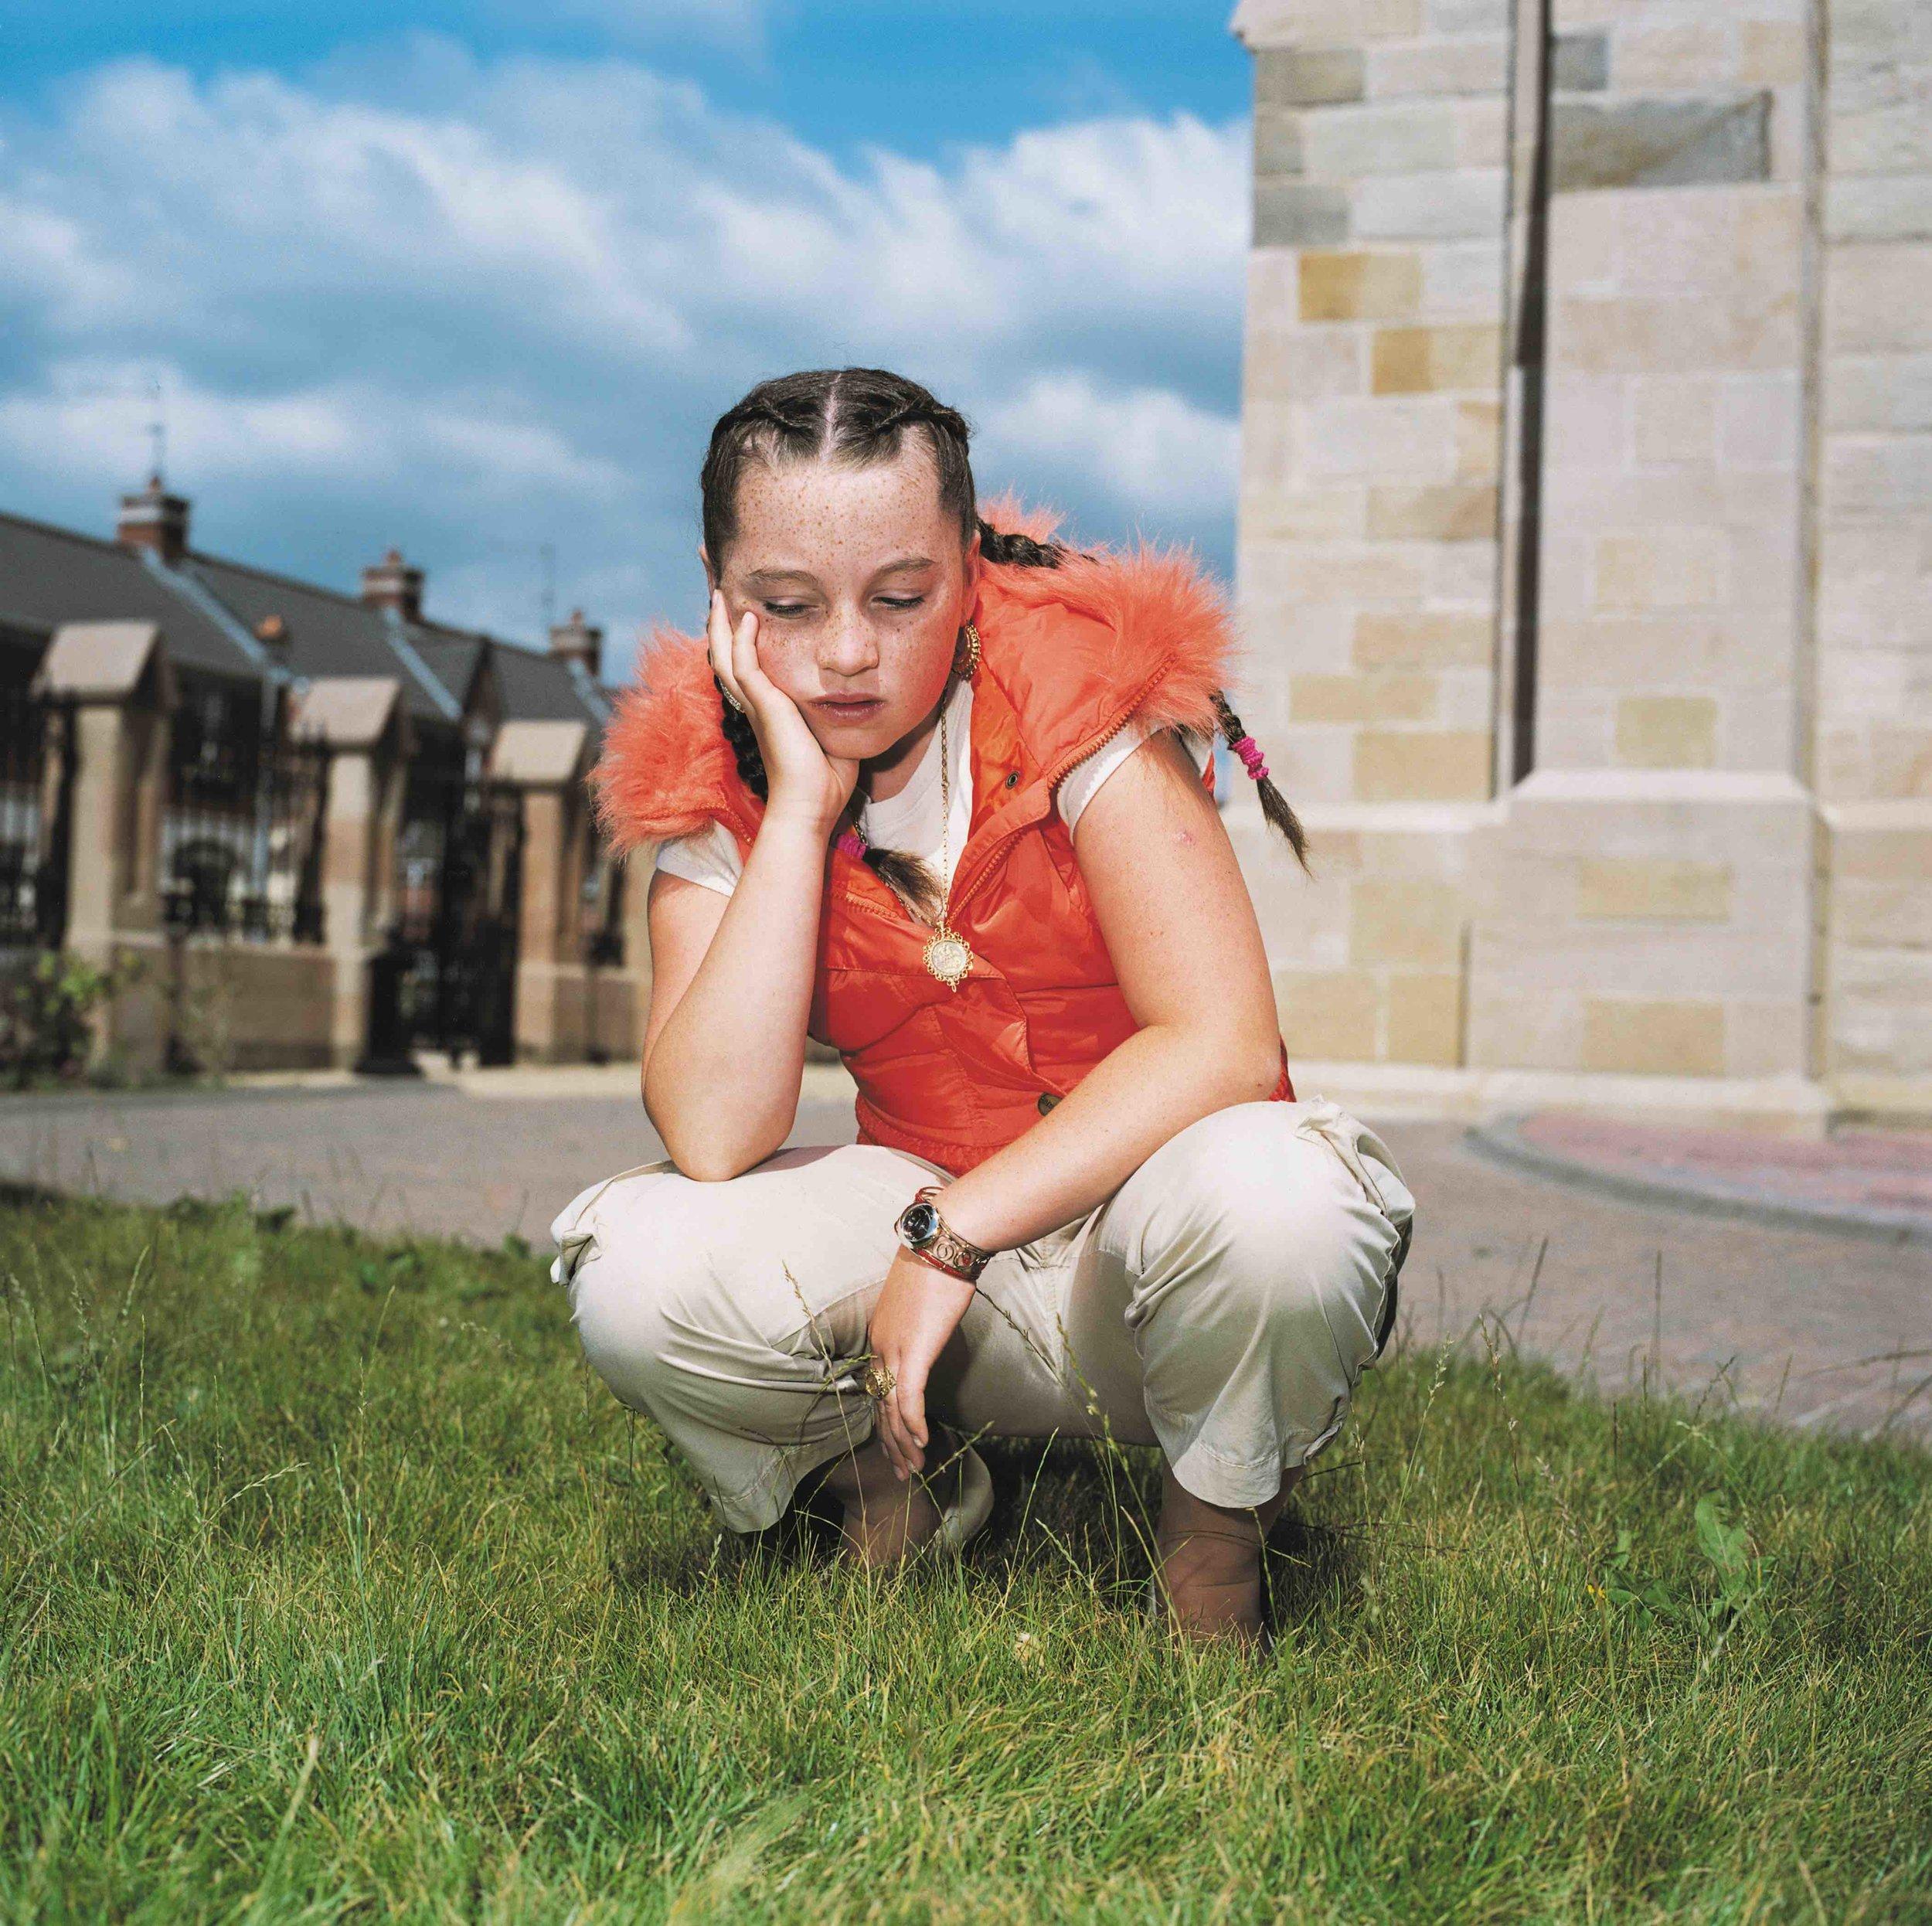 Jolene from the 'Teenagers Belfast' series